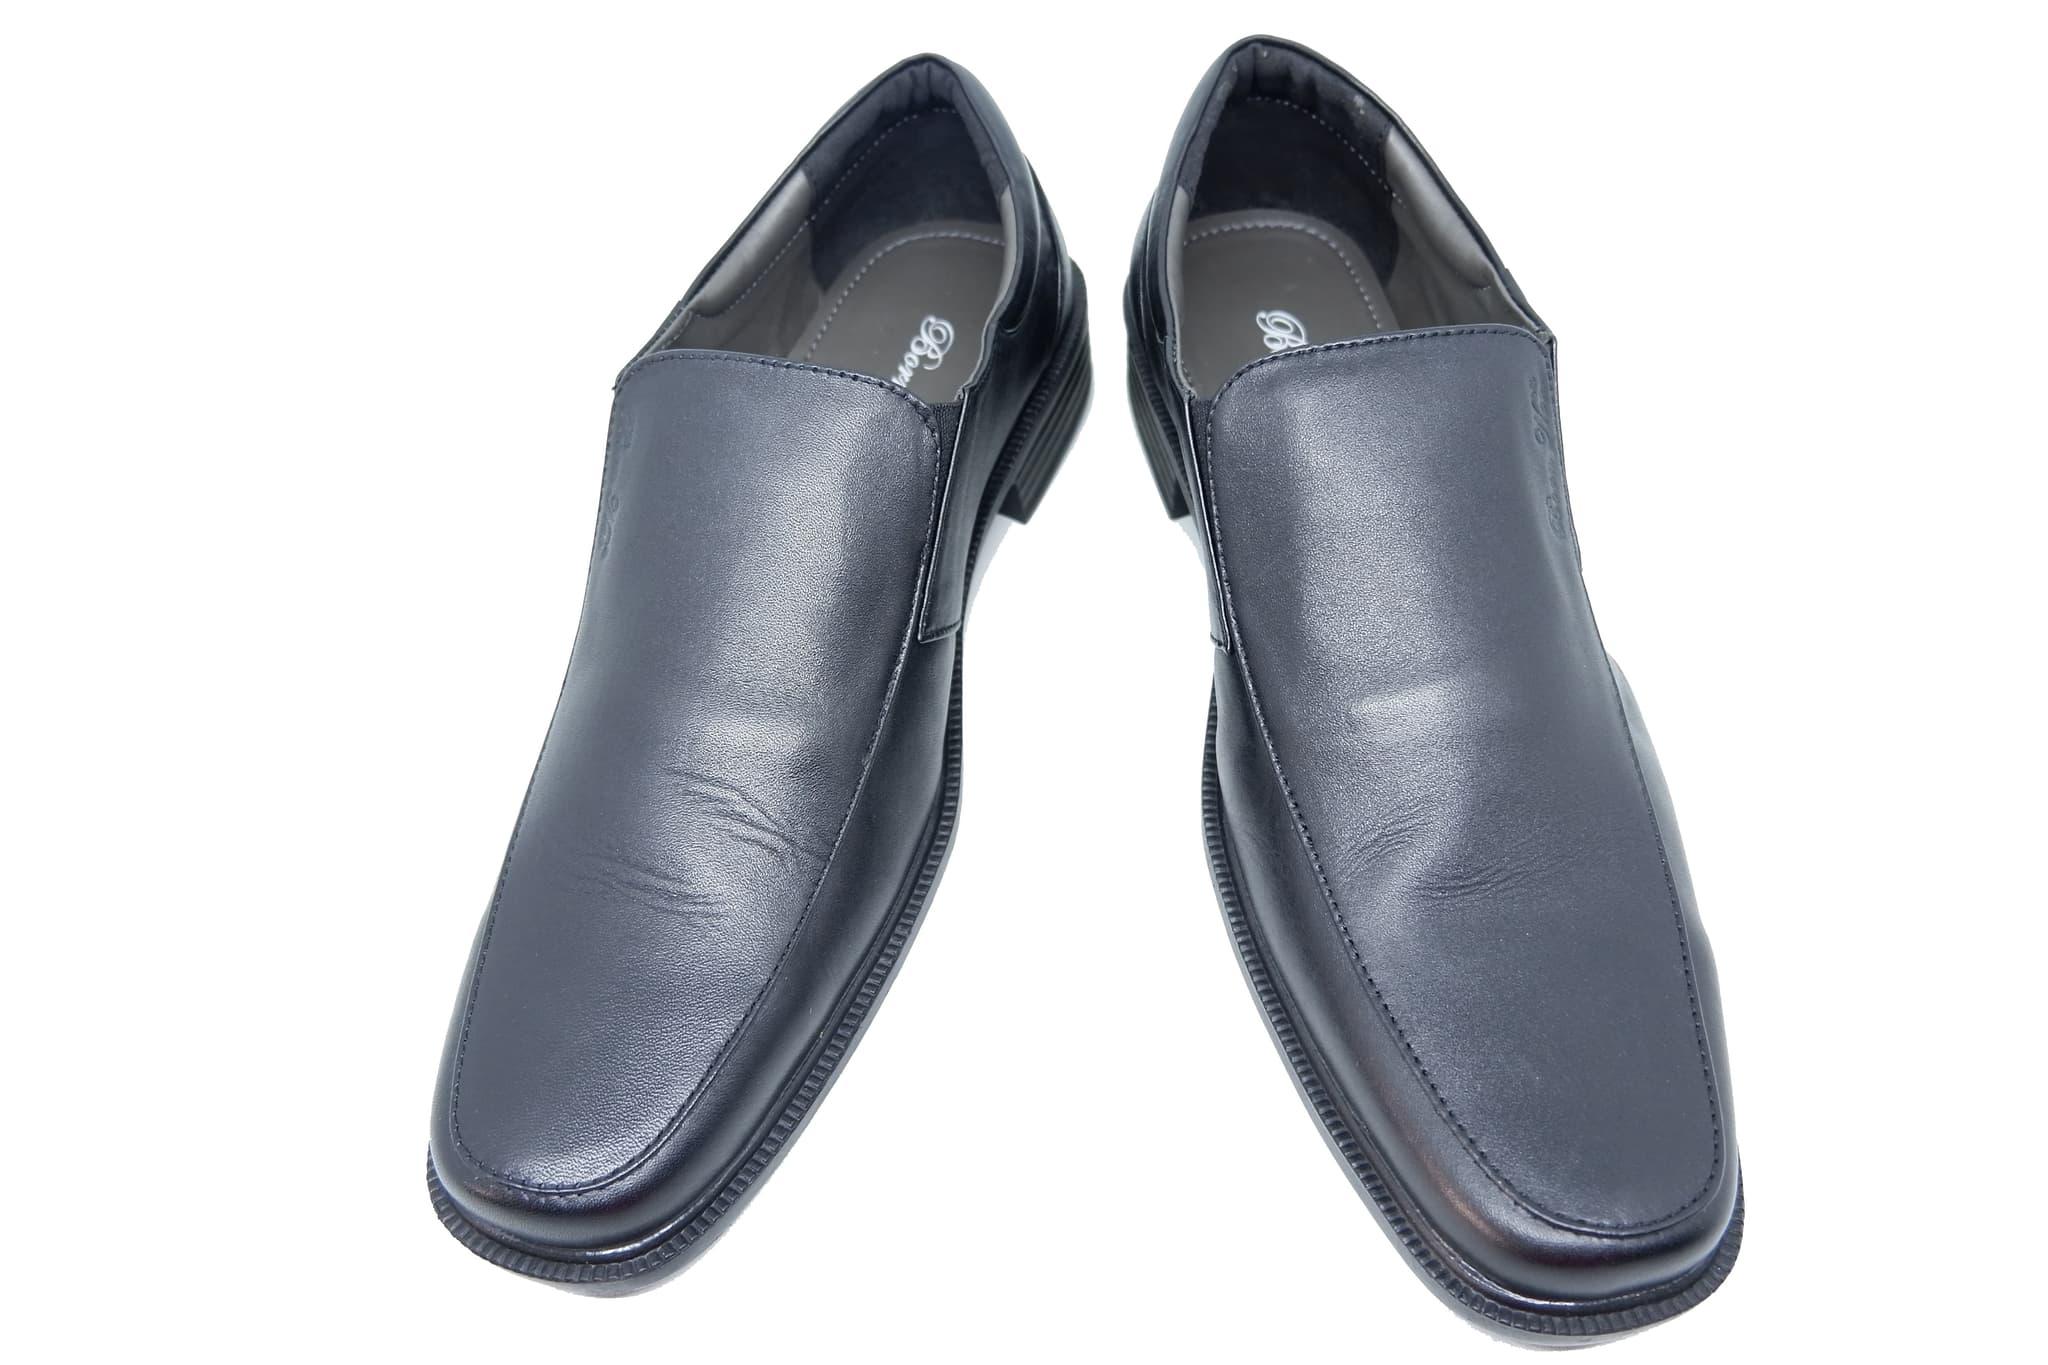 Jual Born Neo Sepatu Pantofel Kulit Asli Bn.pf-0212  2b7fce90c2